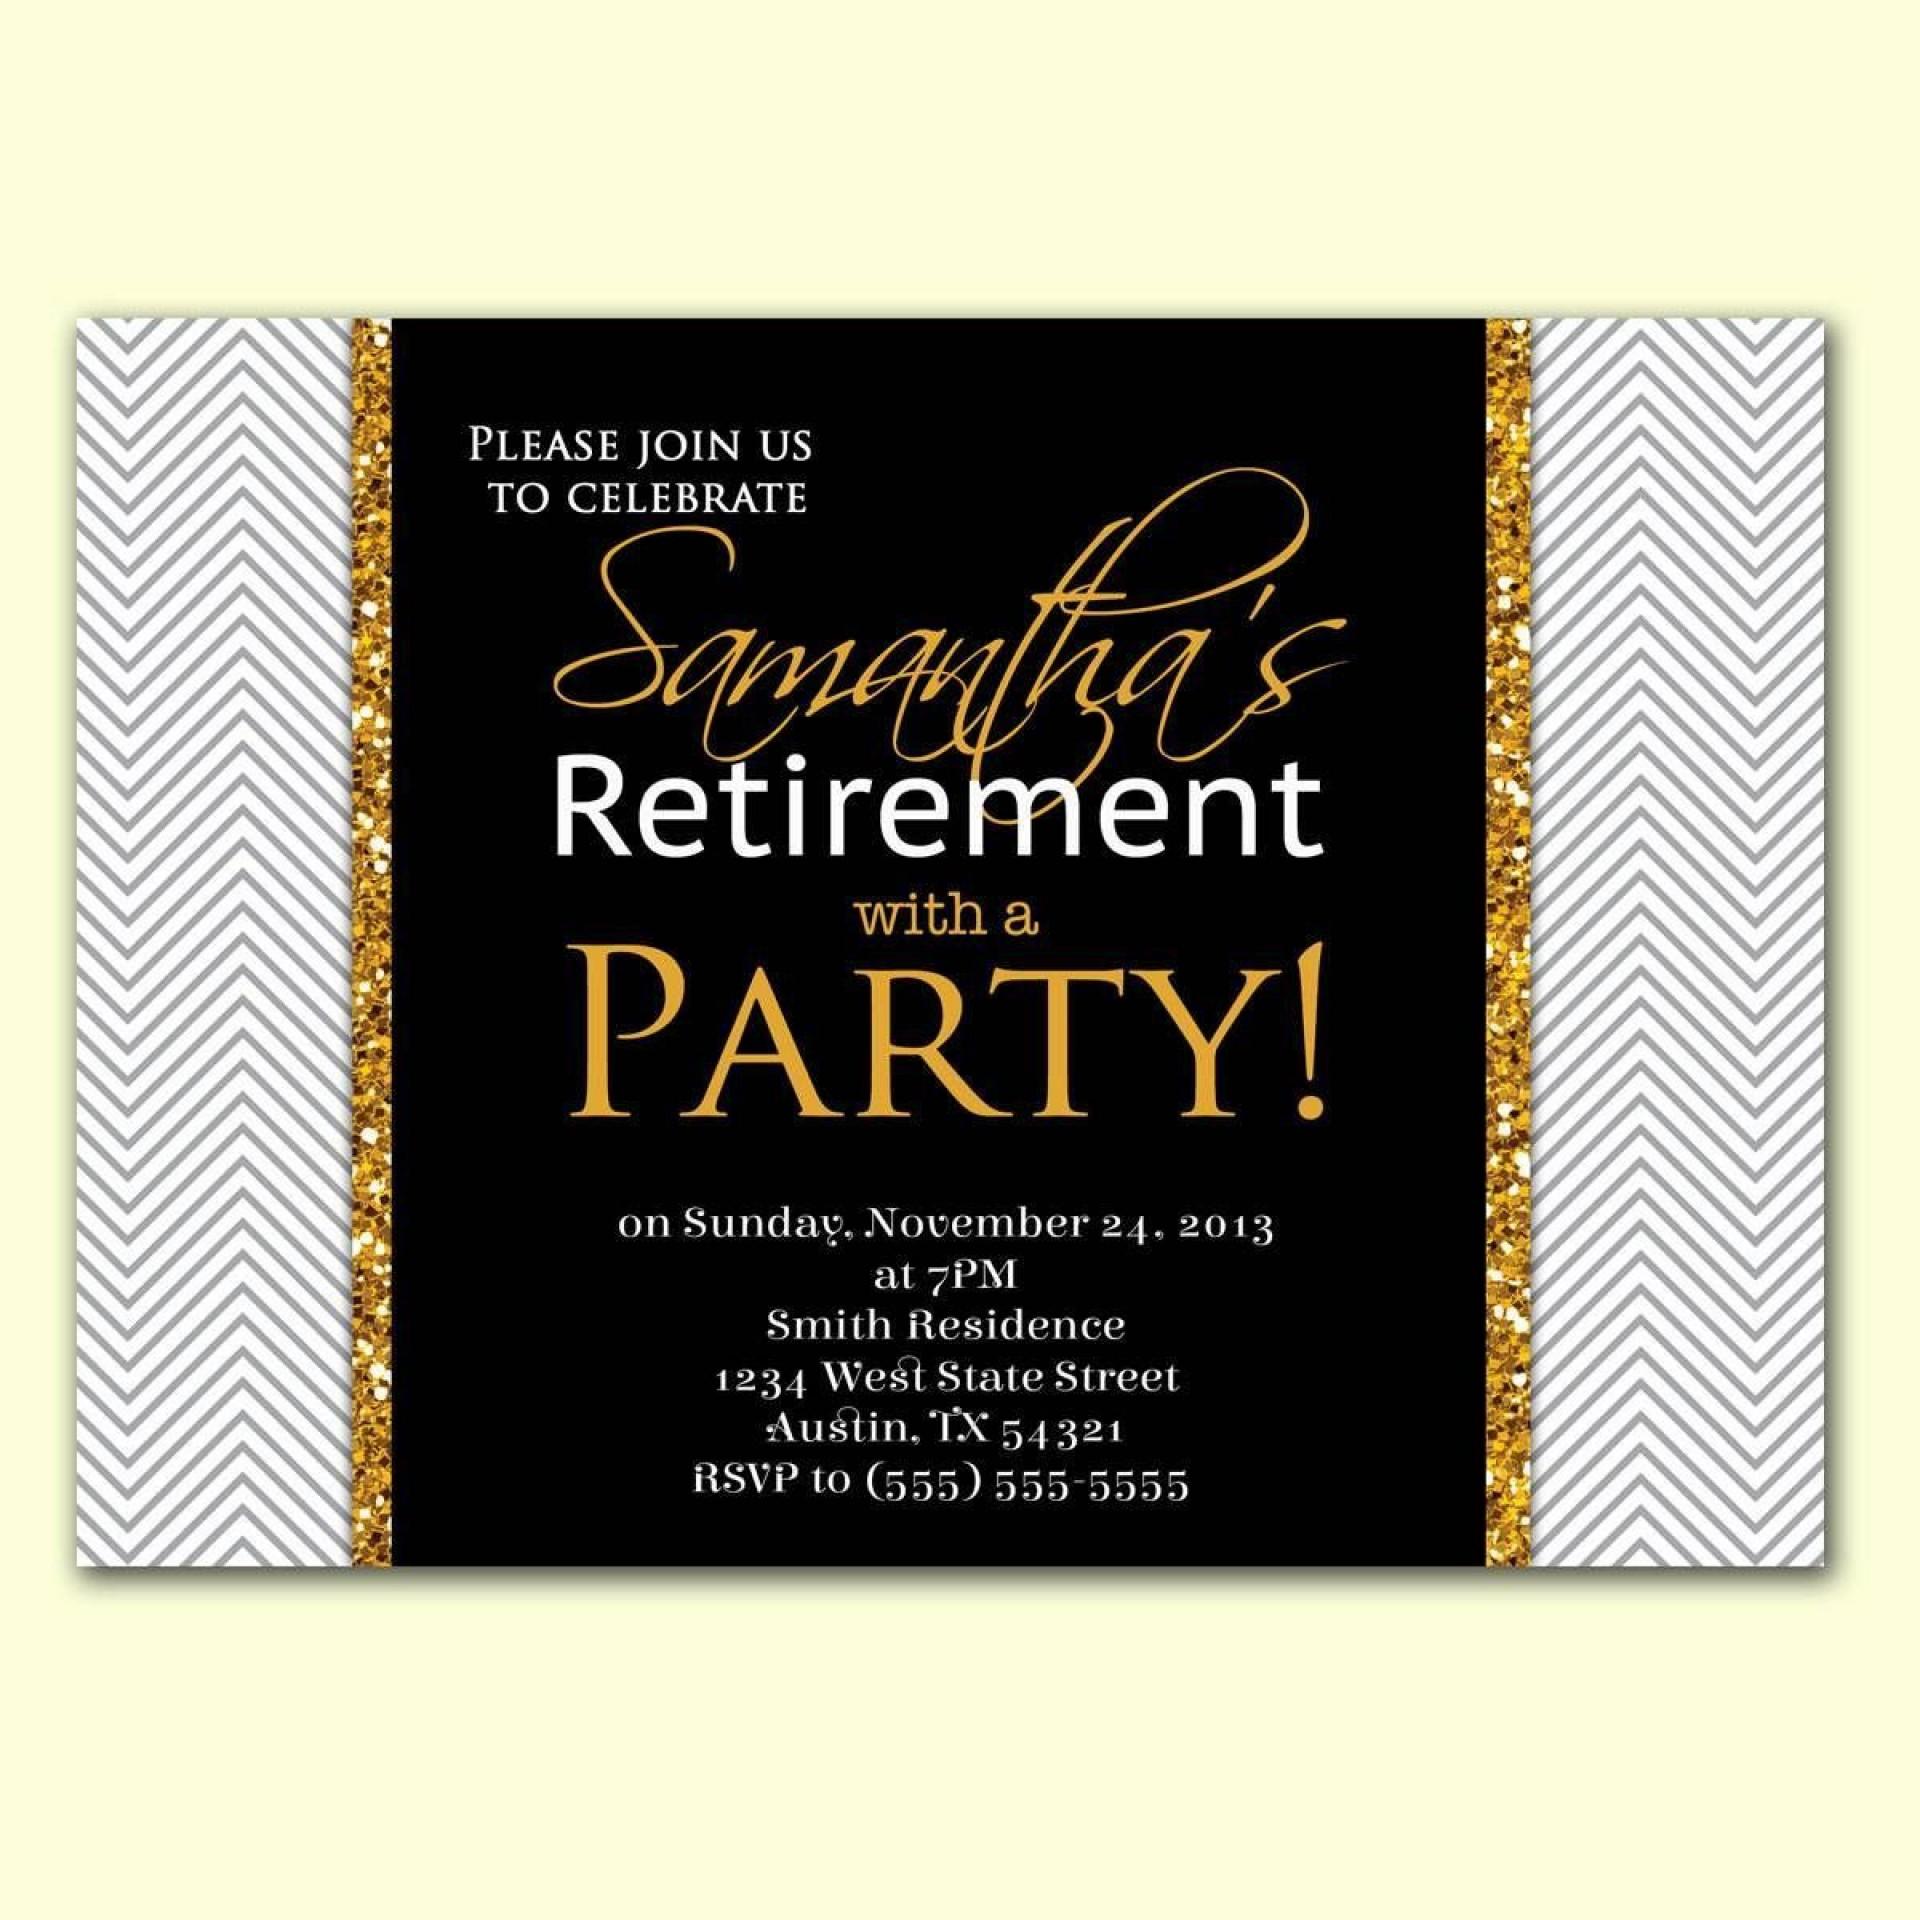 004 Unusual Retirement Party Invite Template Concept  Invitation Online M Word Free1920